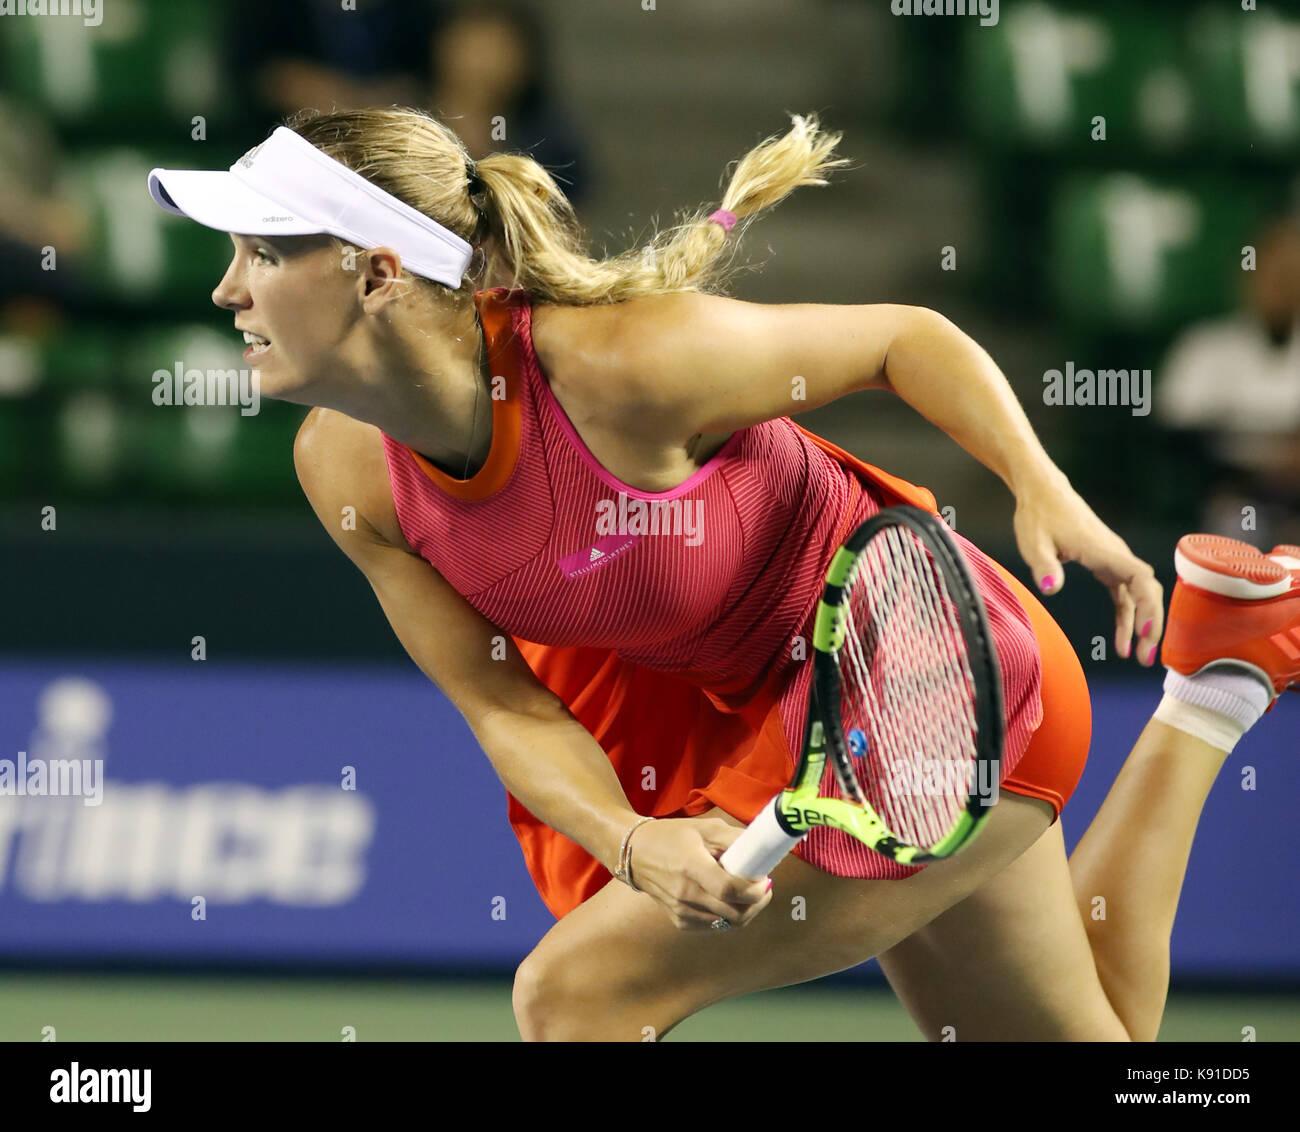 Tokyo, Japan. 21st Sep, 2017. Defending champion Caroline Wozniacki of Denmark delivers a service against Shelby - Stock Image